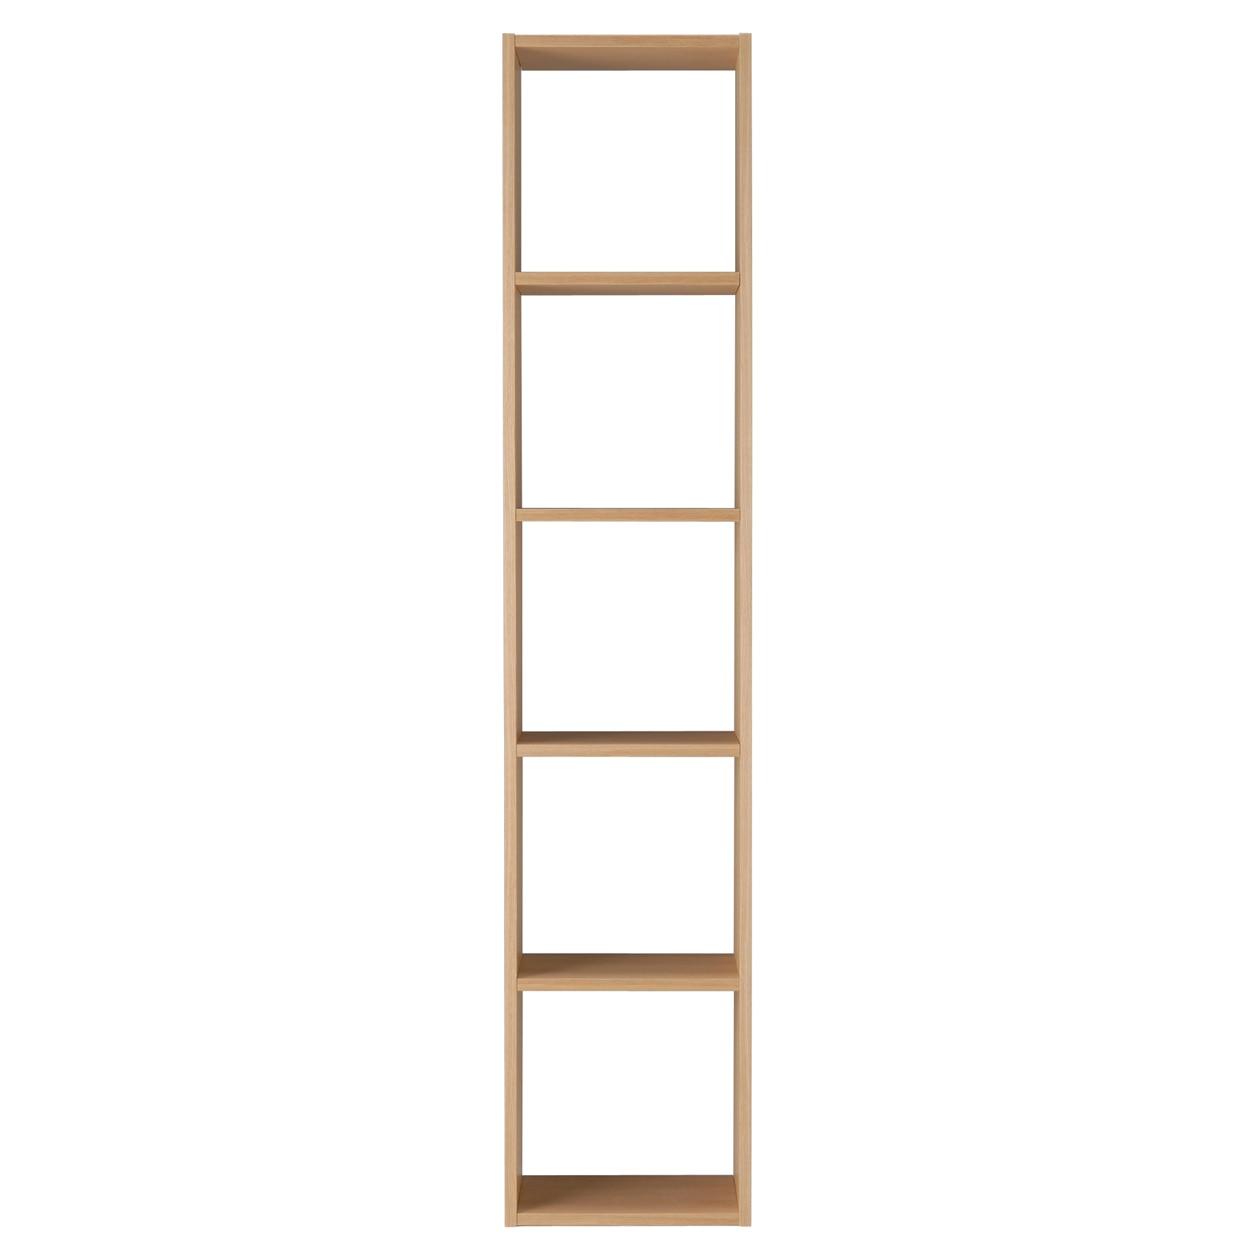 RoomClip商品情報 - スタッキングシェルフ・5段・オーク材